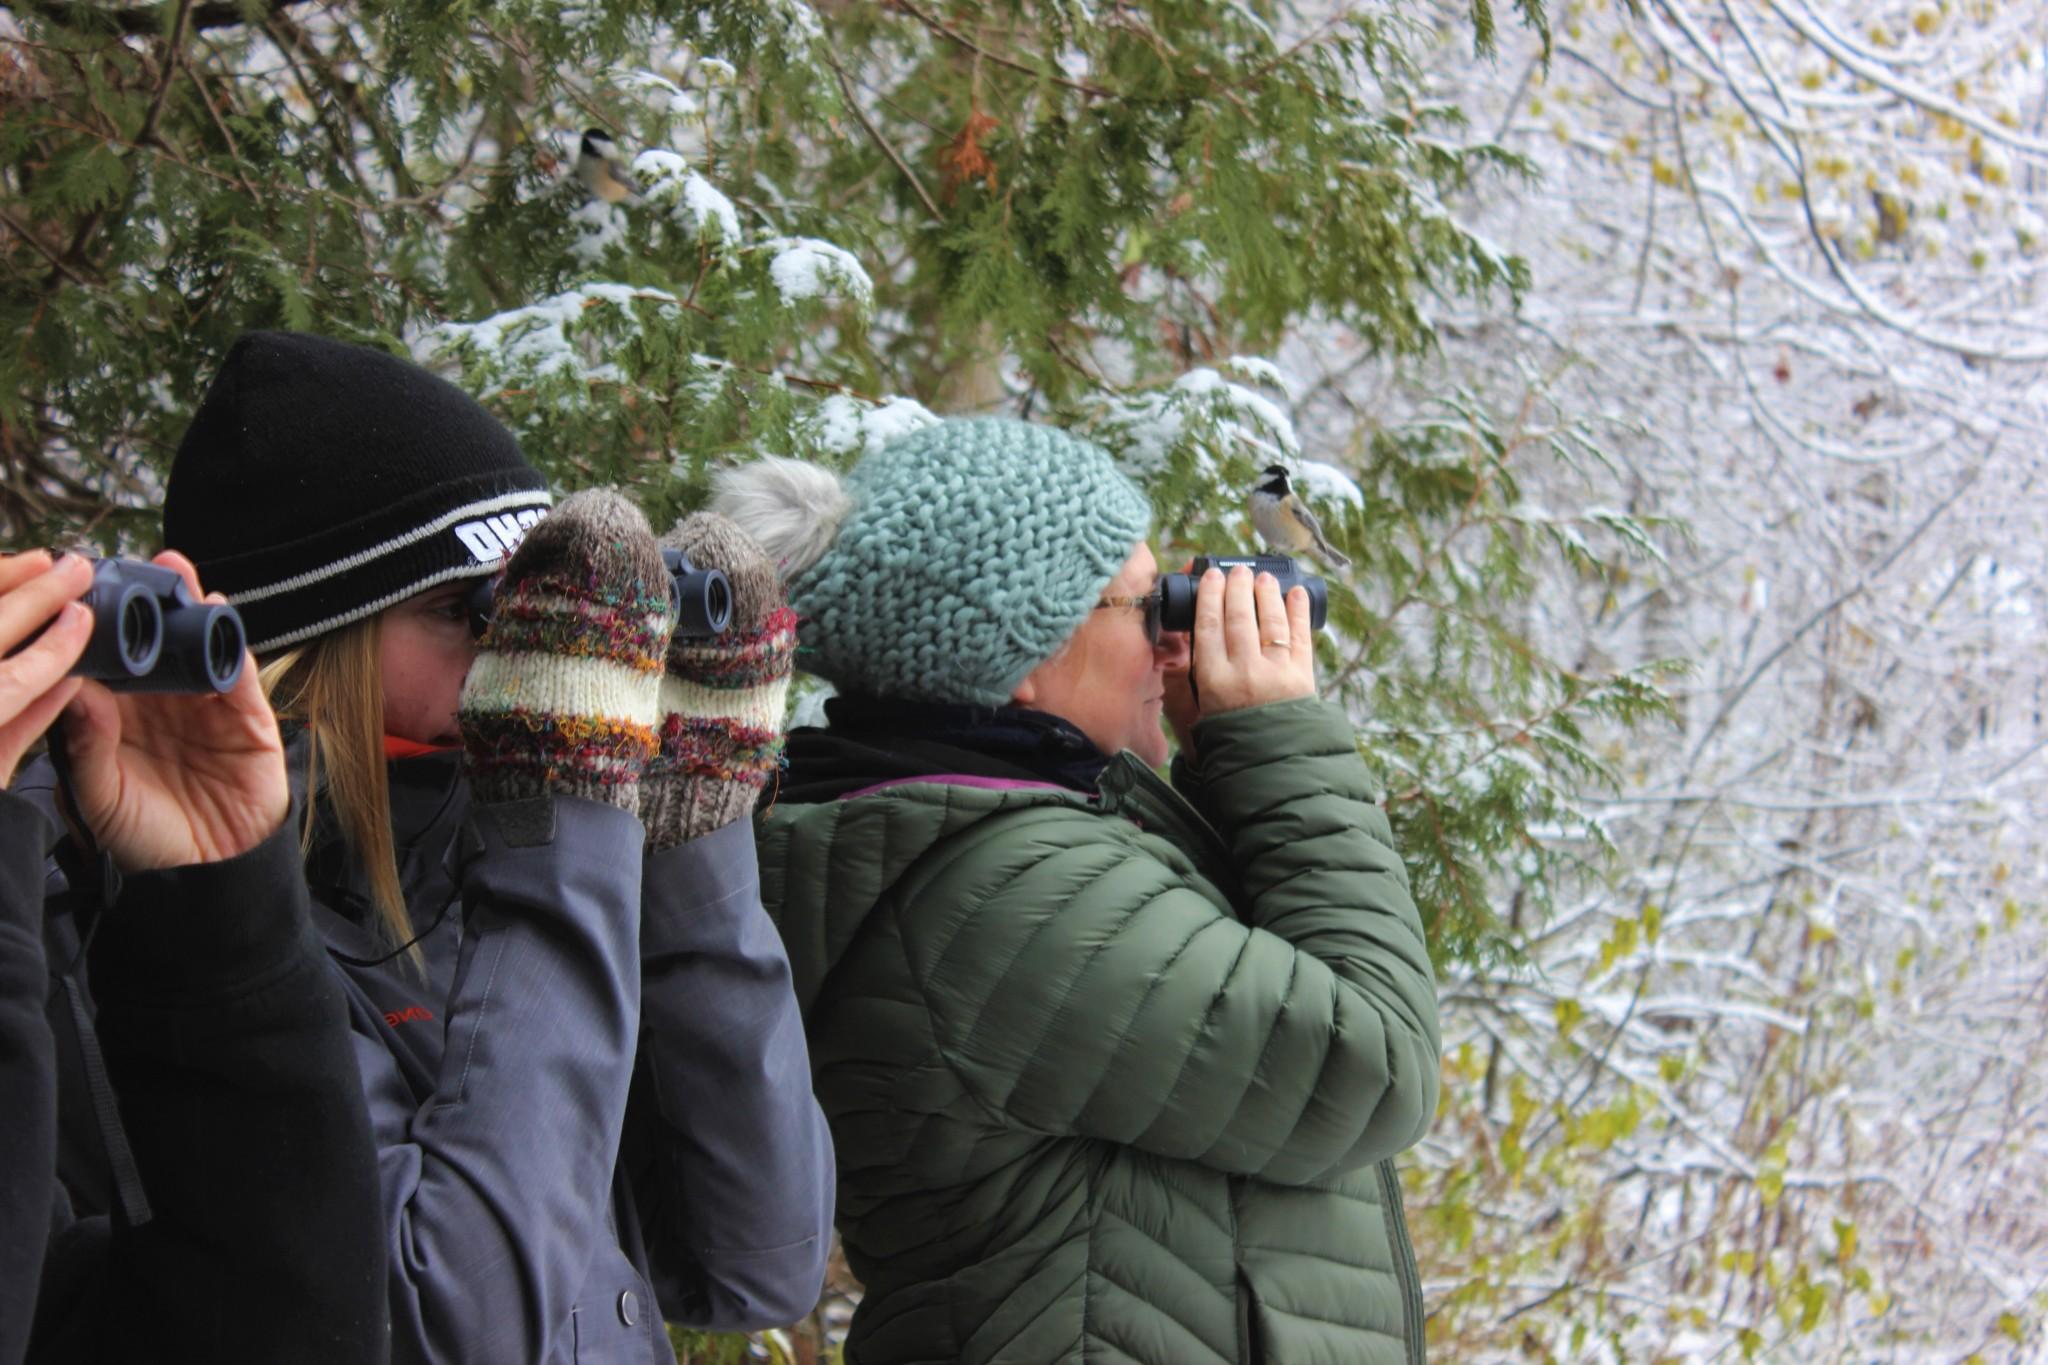 Build Your Birding Skills - BUILD YOUR BIRDING SKILLS